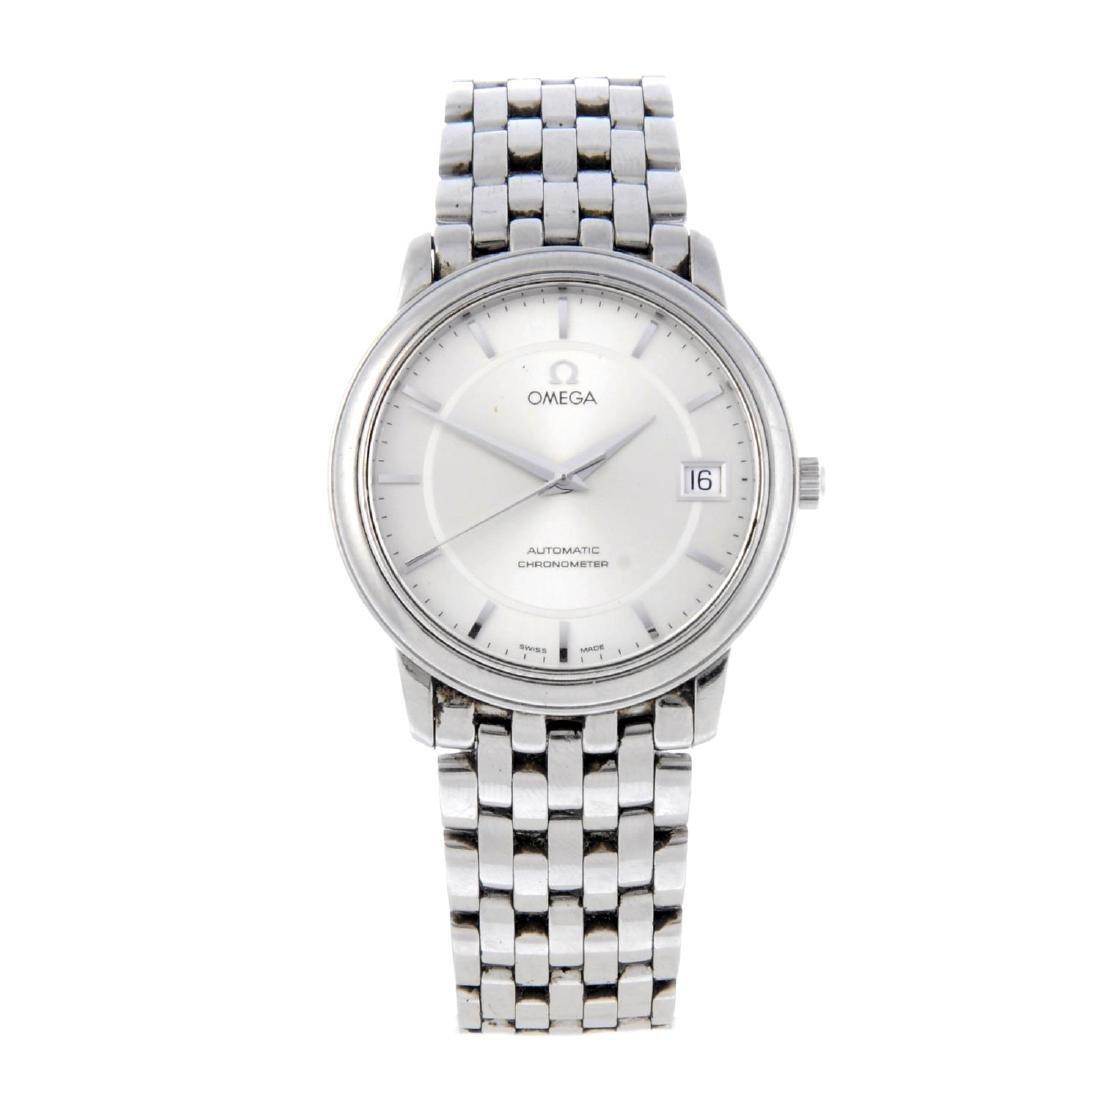 OMEGA - a gentleman's bracelet watch. Stainless steel